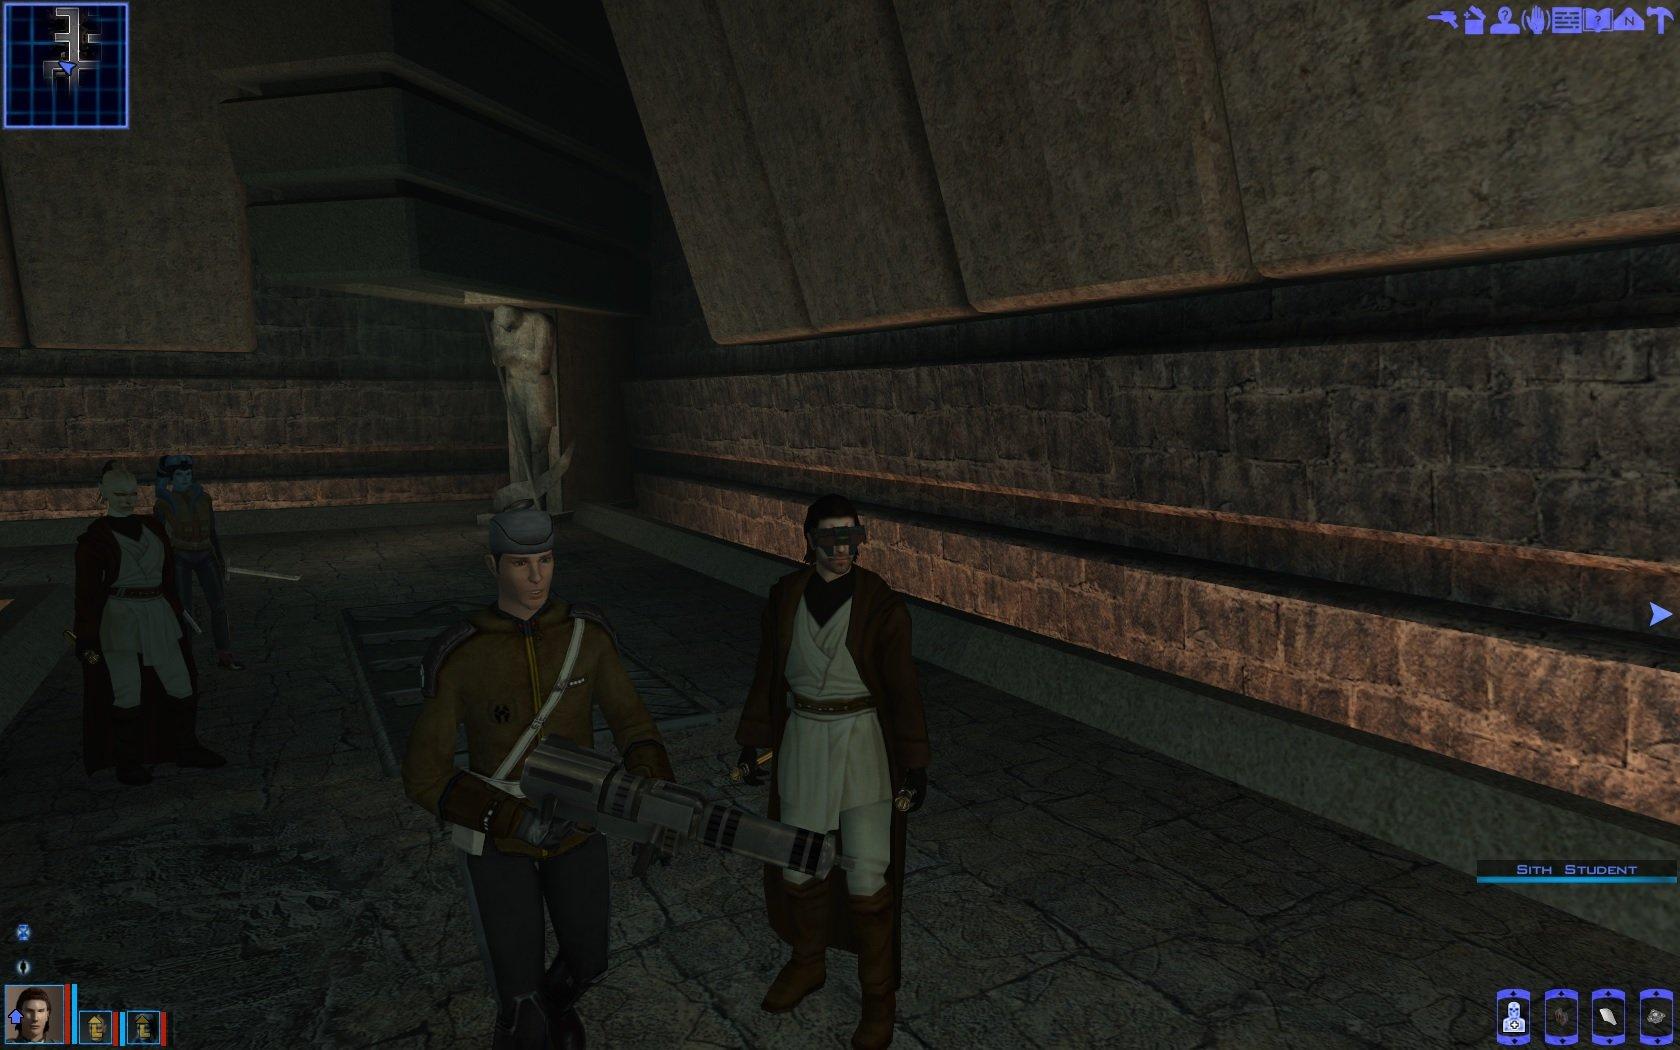 Korriban-Sith-Guard-at-the-academy.jpg